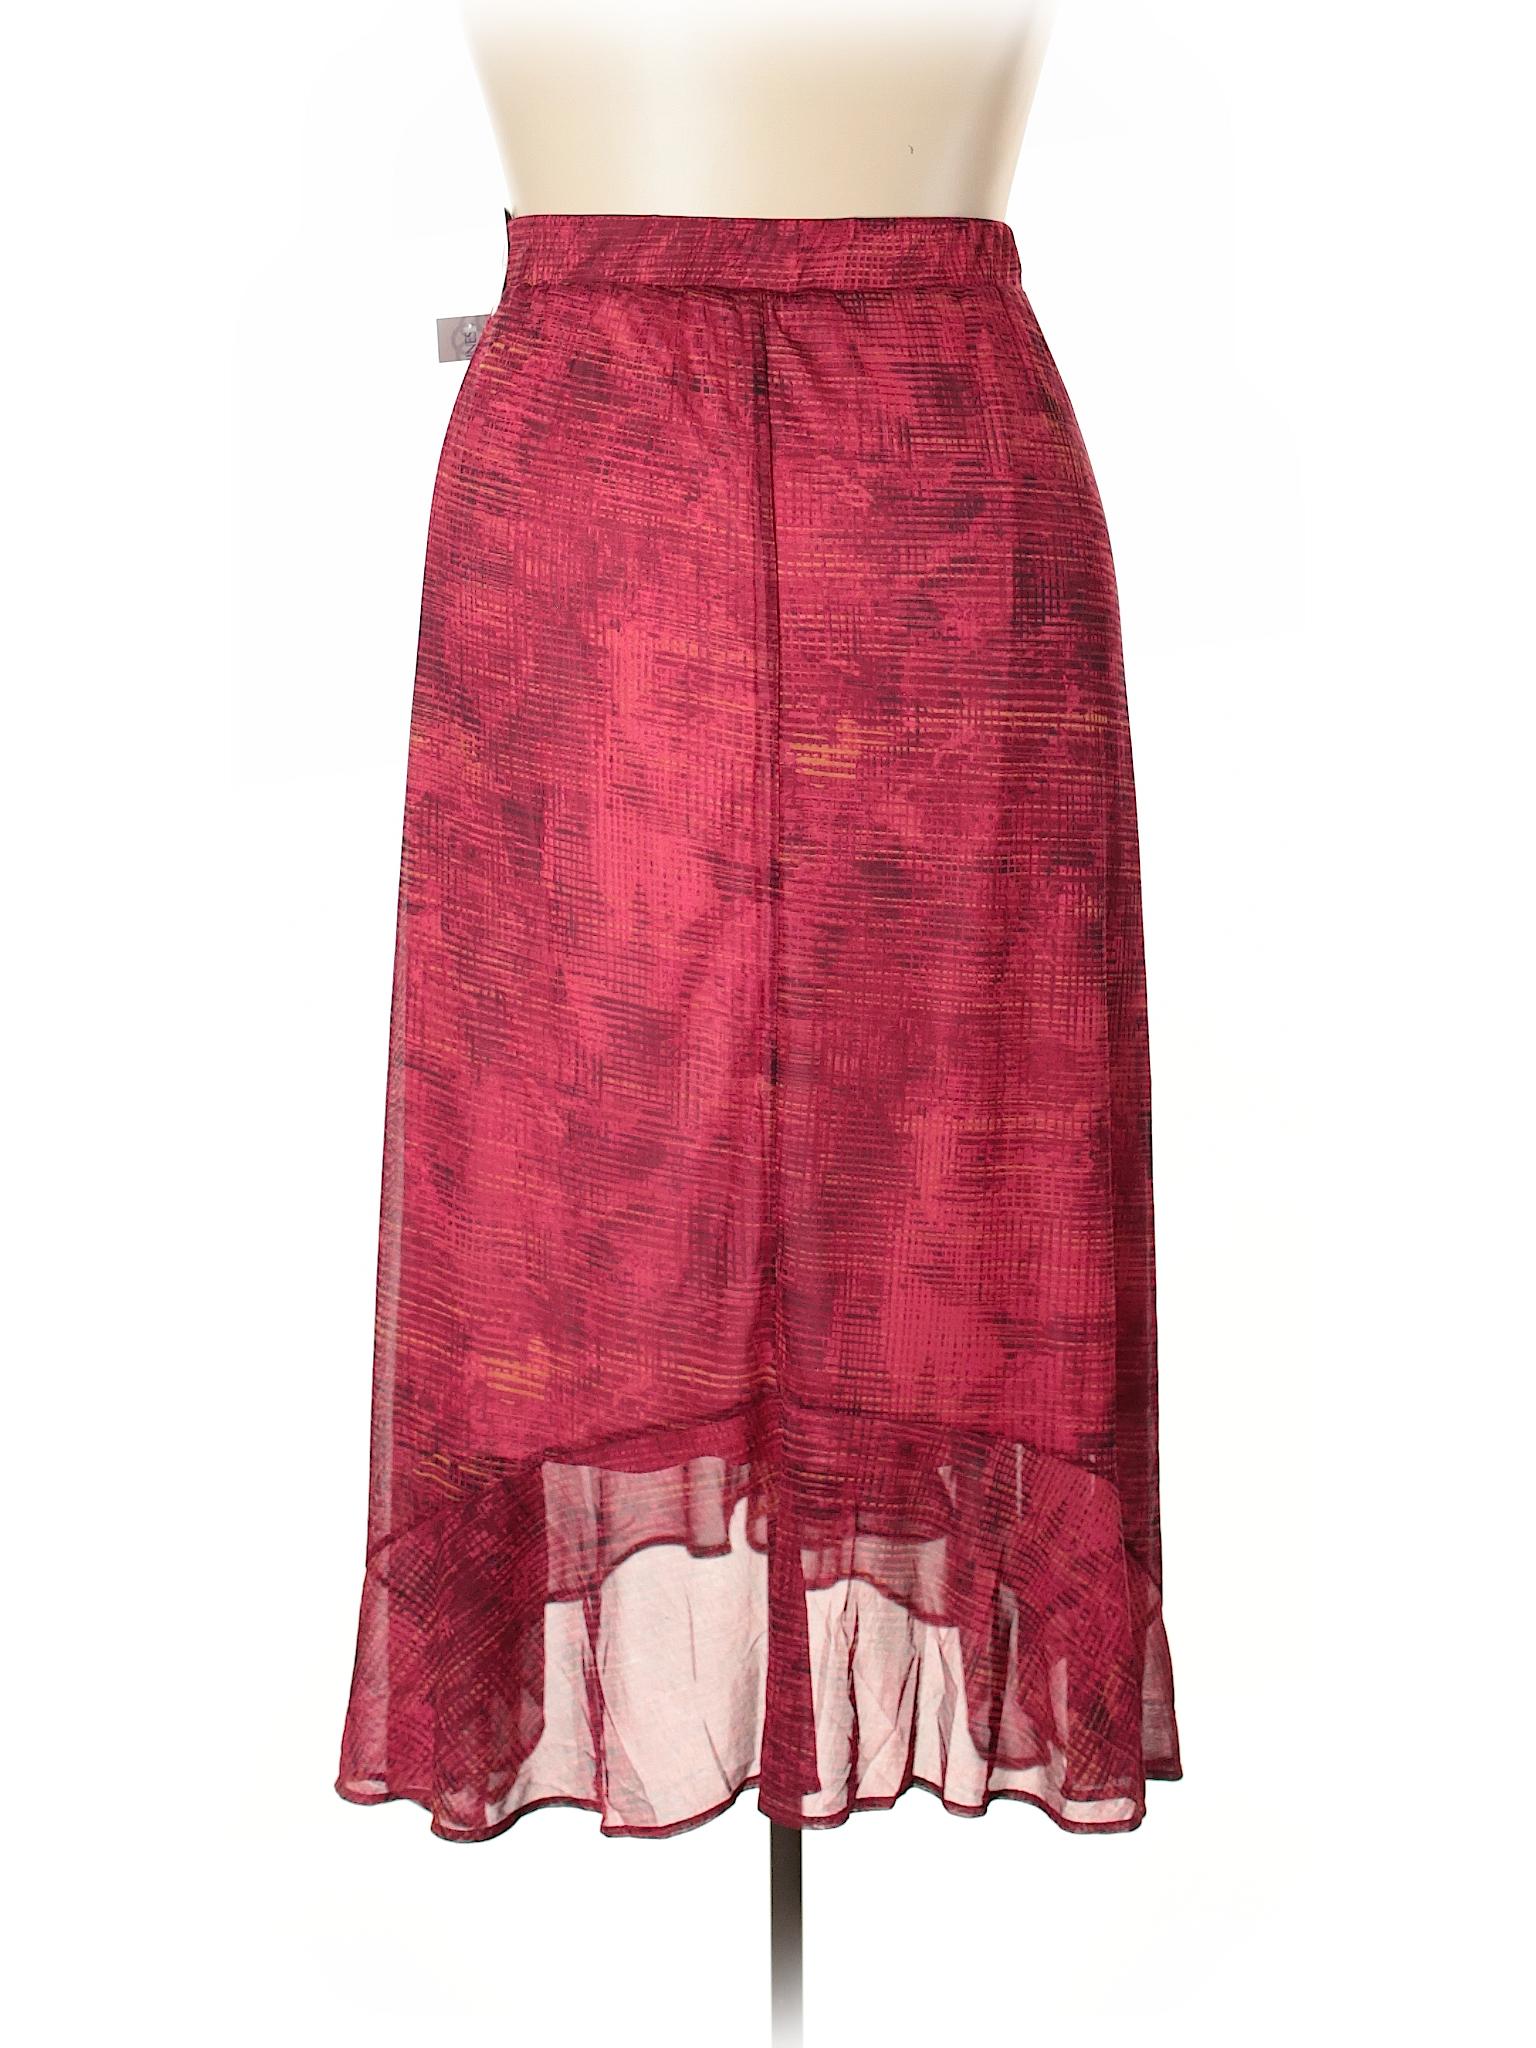 Casual Boutique Skirt Boutique Boutique Casual Casual Skirt Skirt q5PBFYx